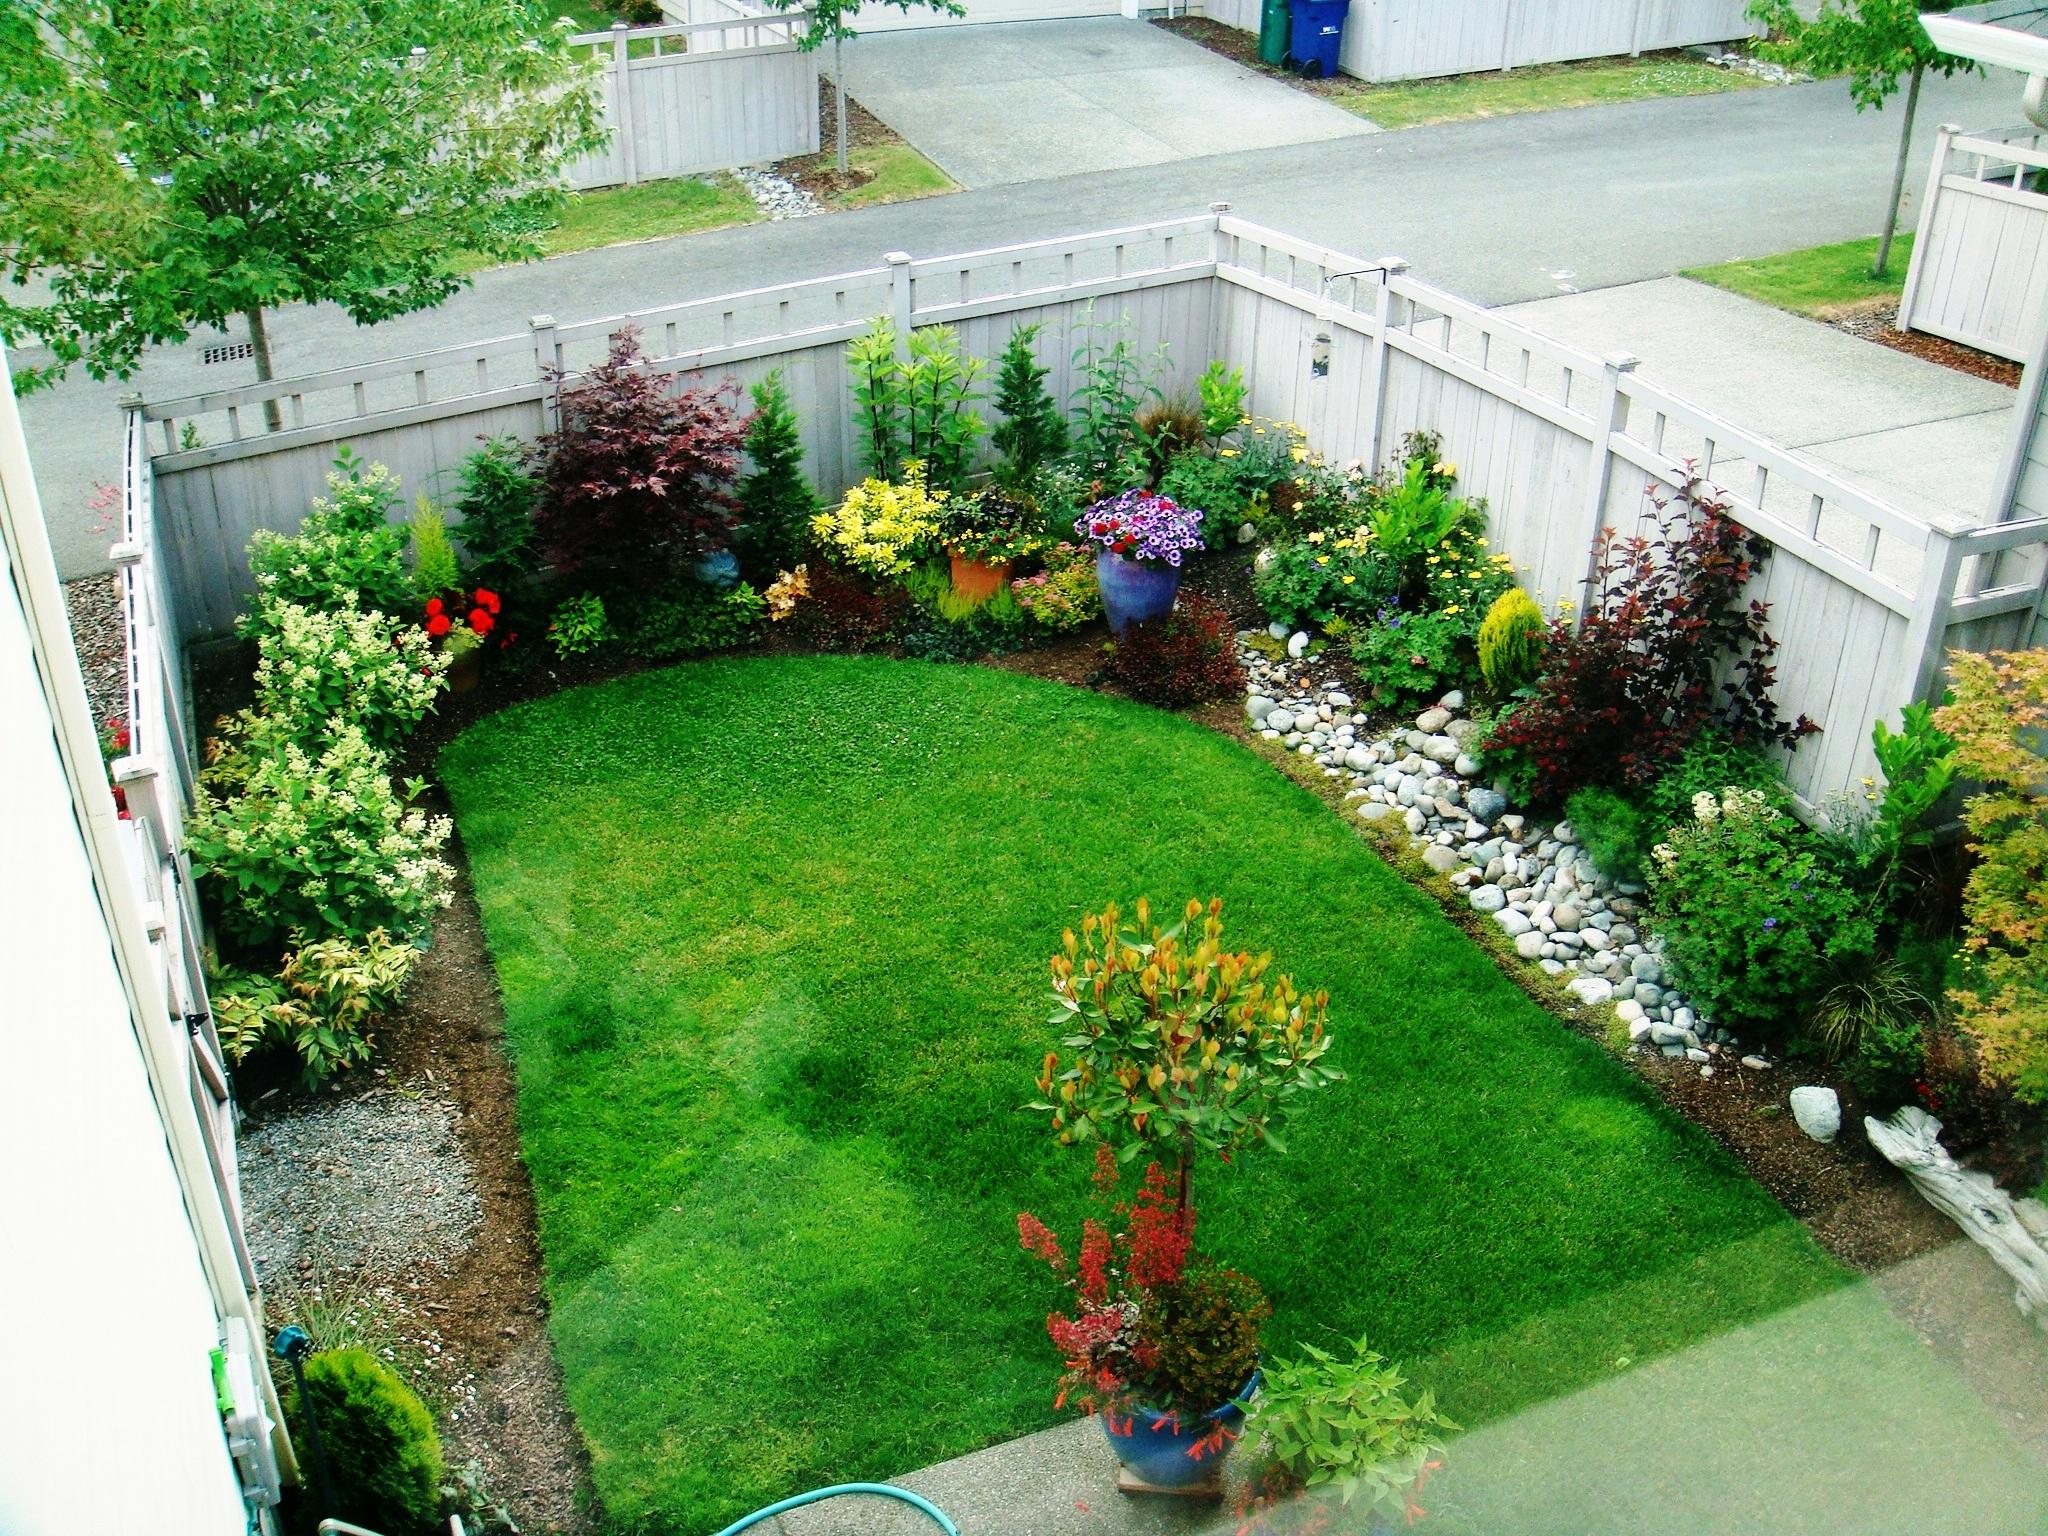 garden landscape design magnificent ideas garden landscaping aroma gardens landscape design meepo s  tips HHZRGFC